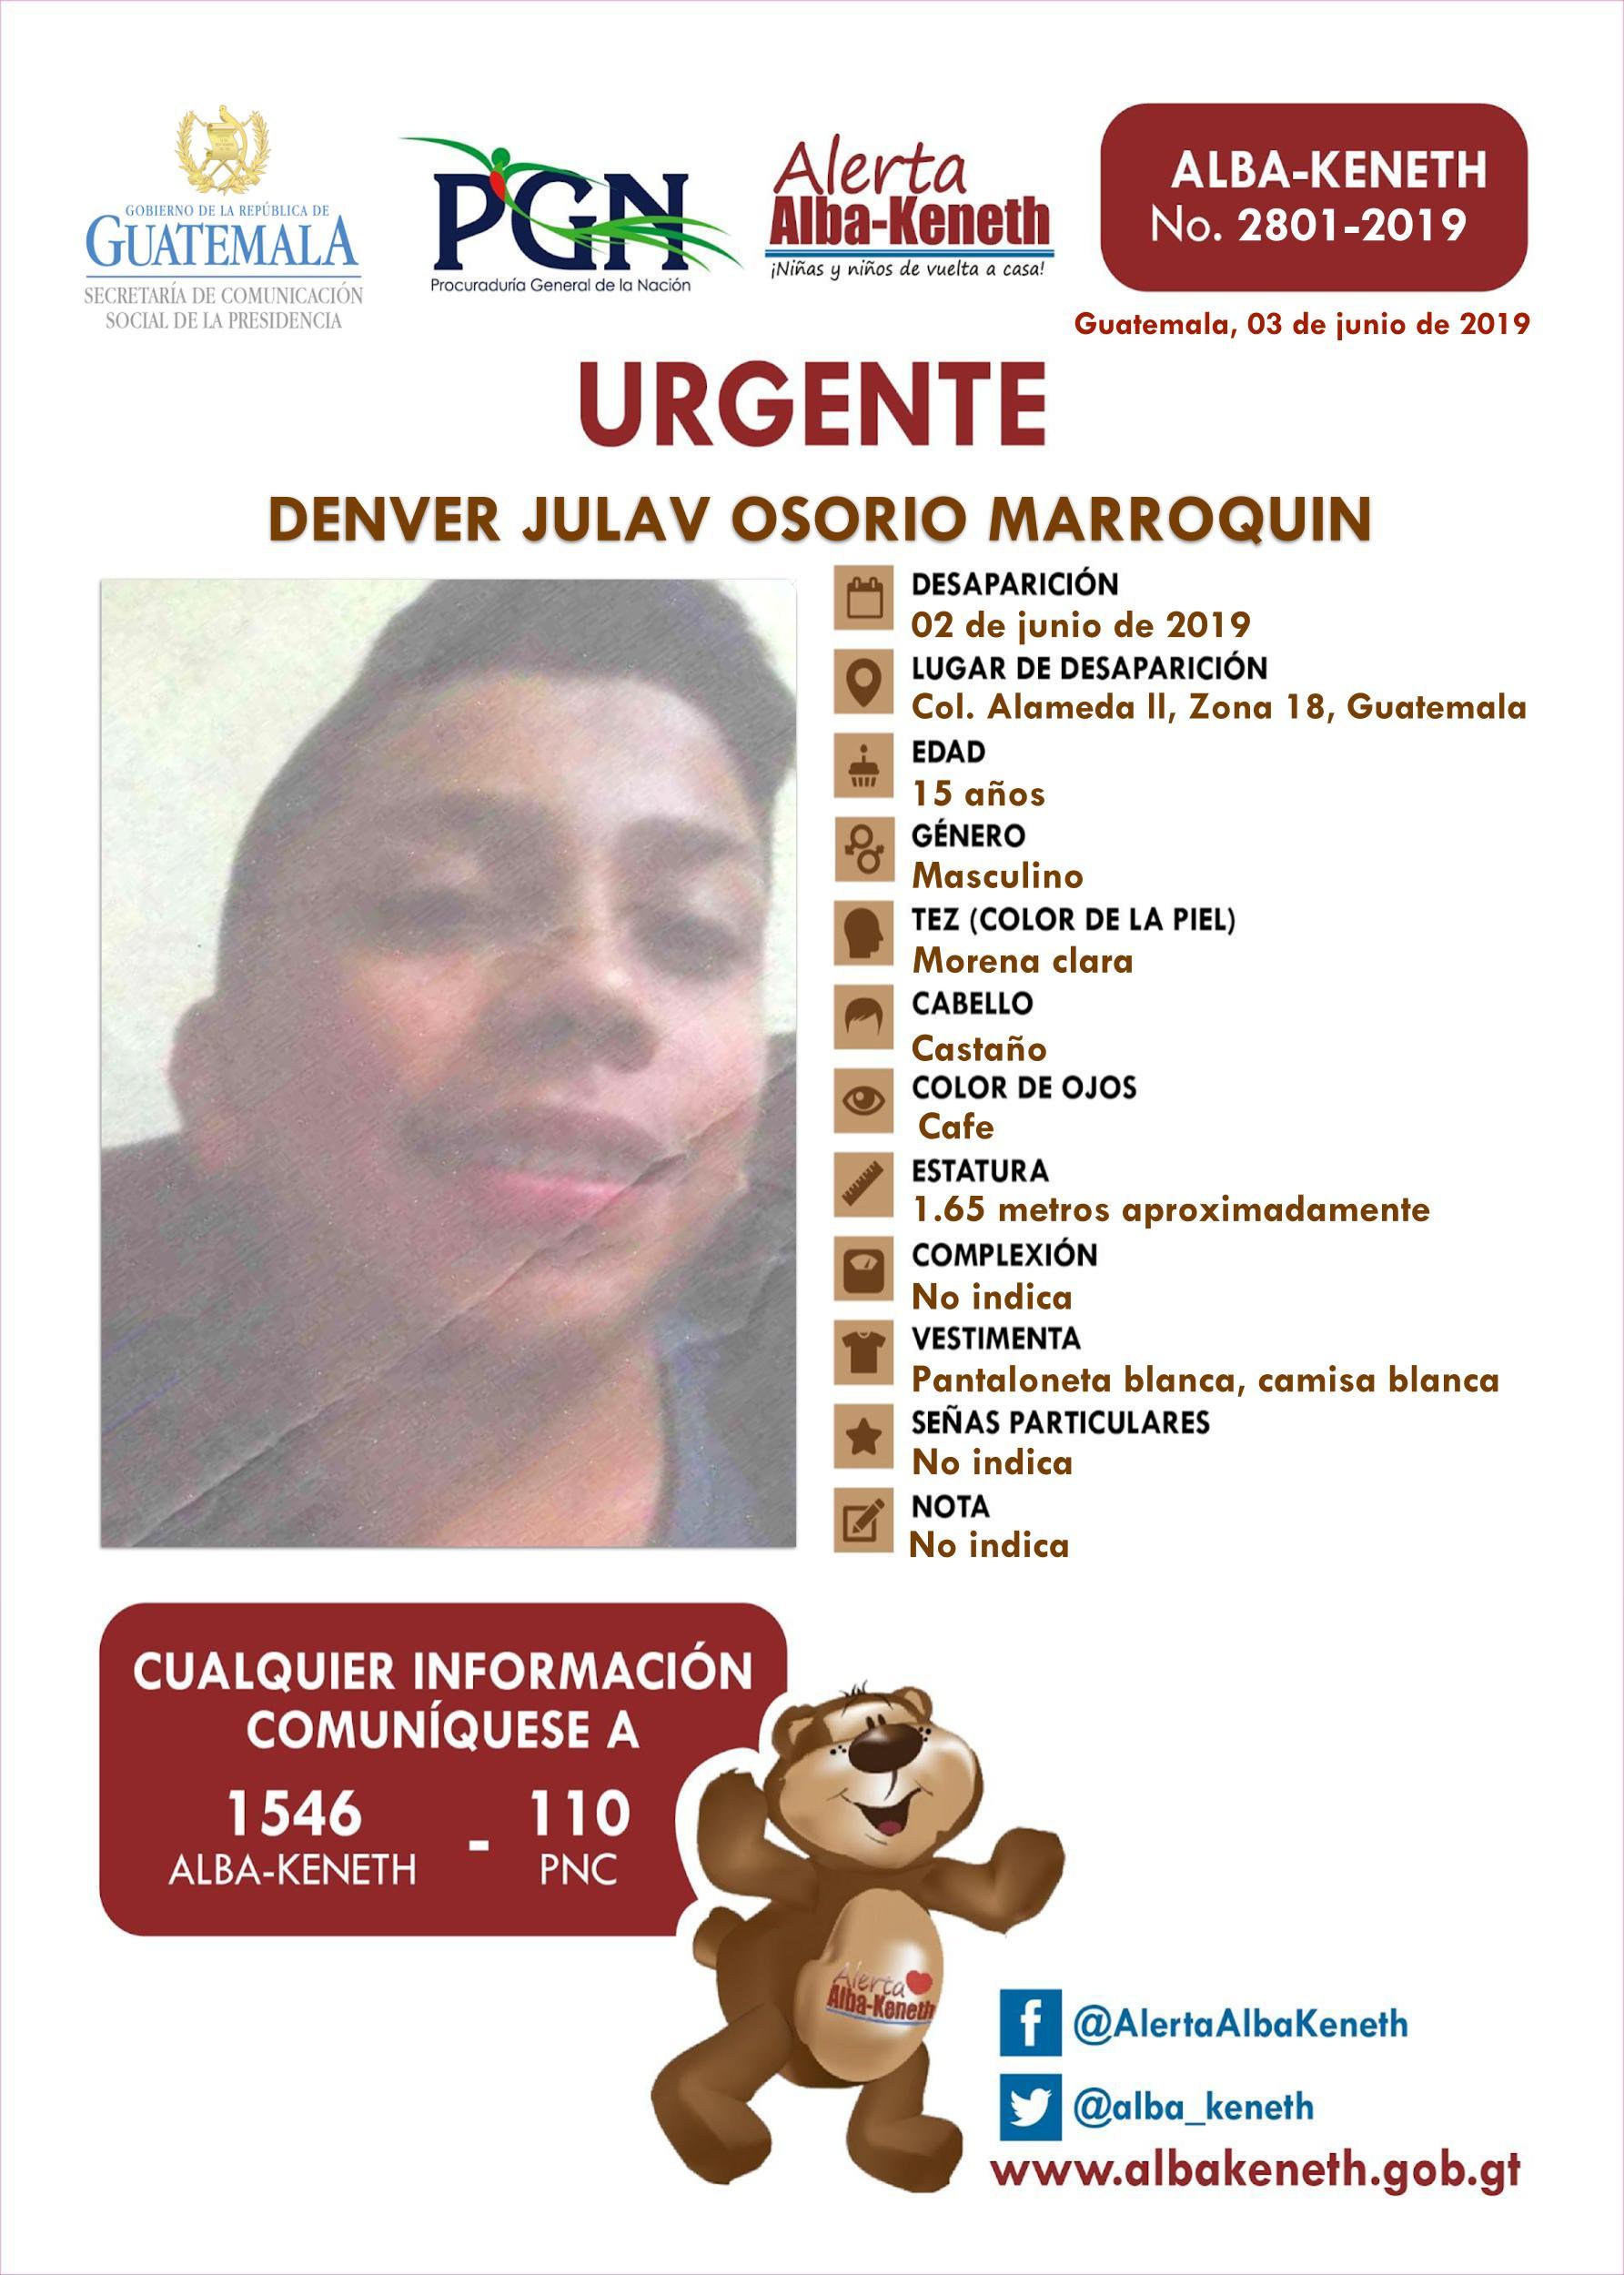 Denver Julav Osorio Marroquin